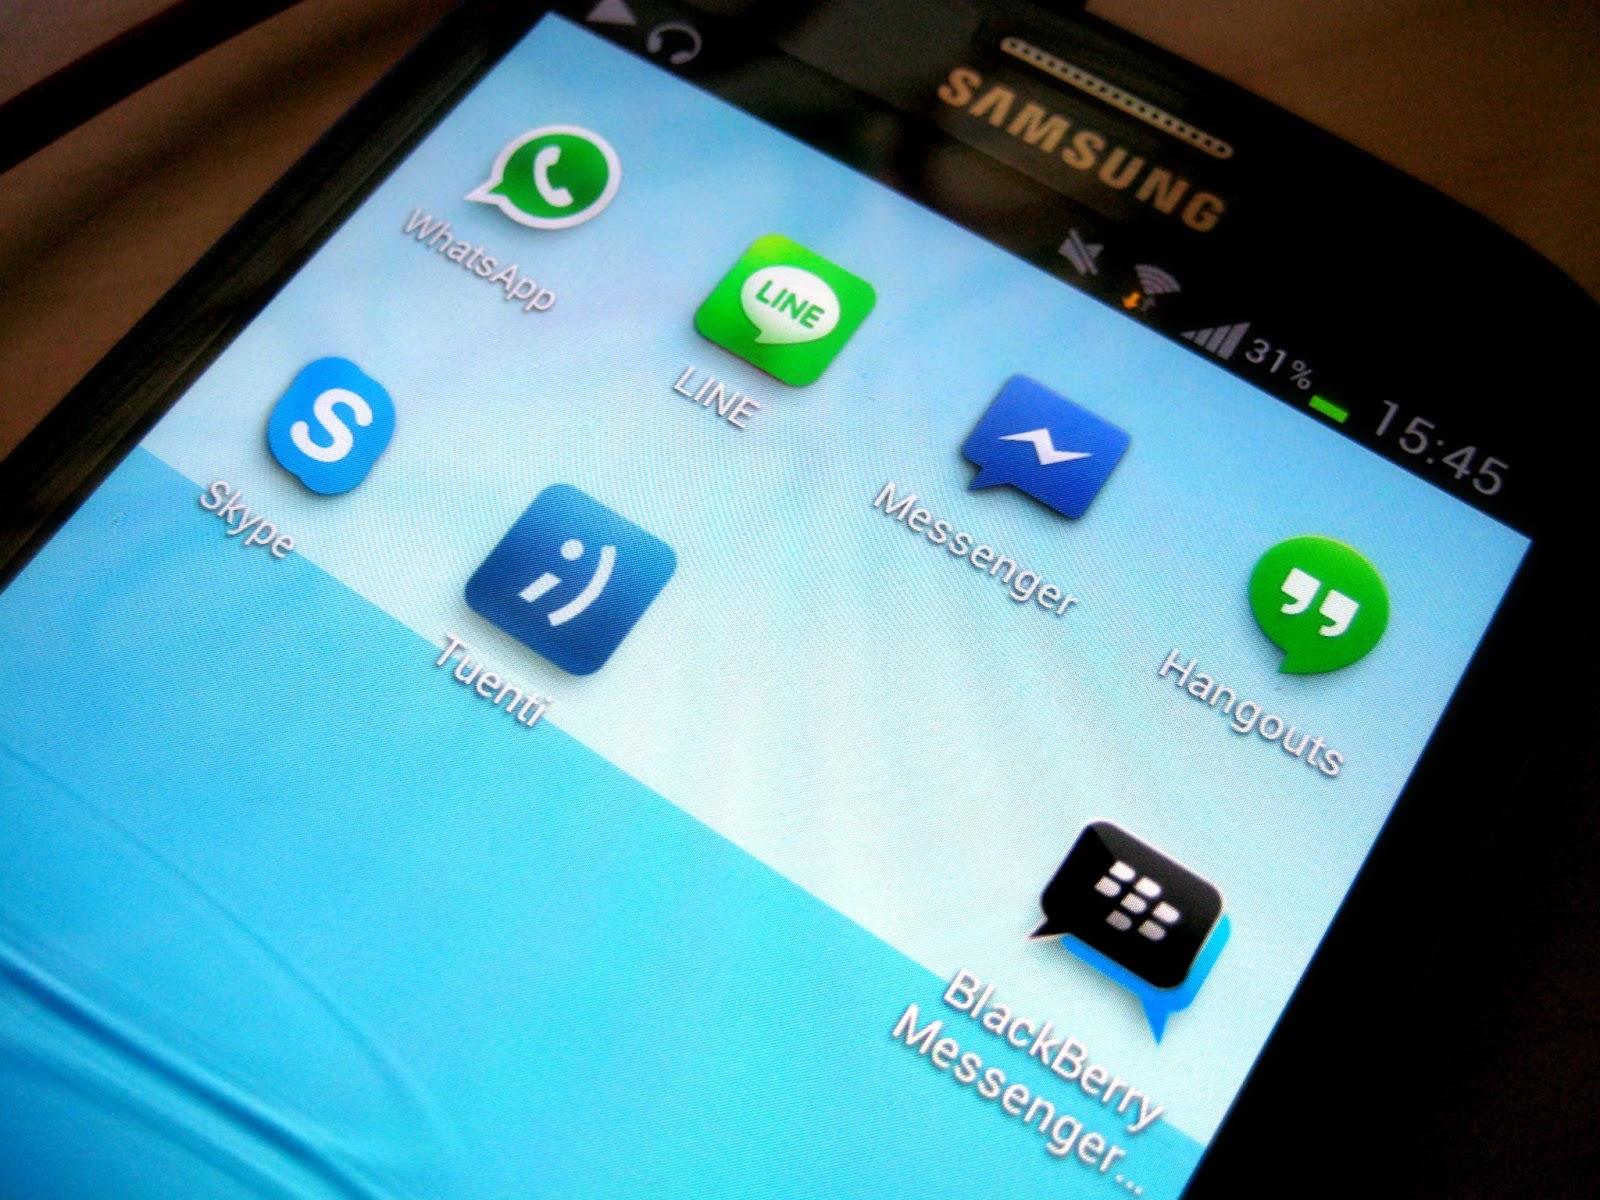 BlackBerry Akan Mengembangkan Pasar Dengan Aplikasi Gingerbread BBM